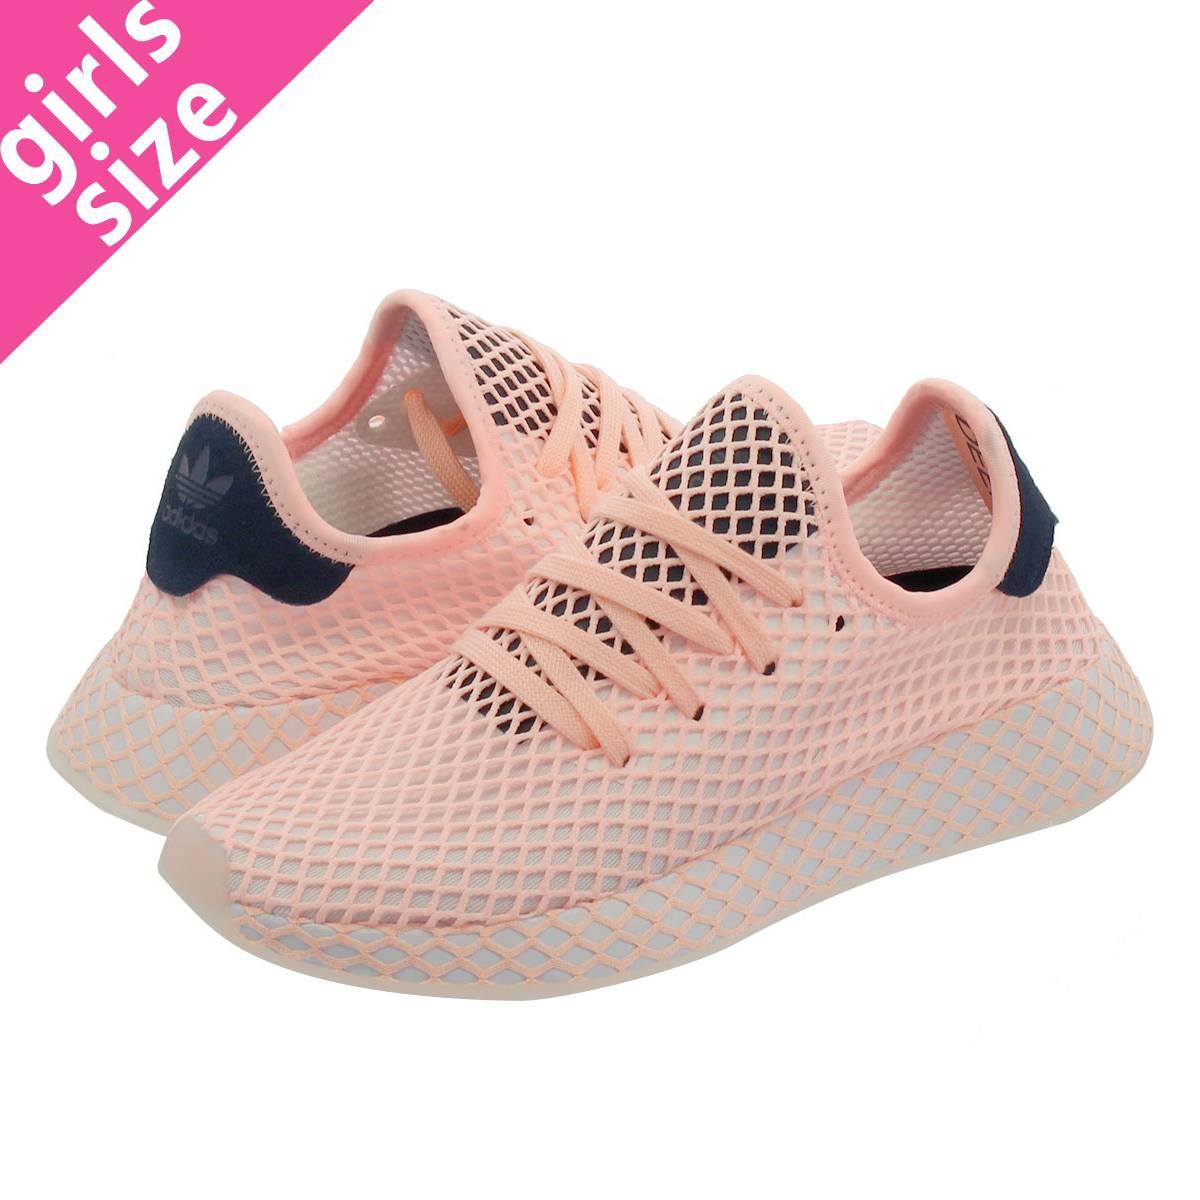 adidas Deerupt Runner W shoes orange